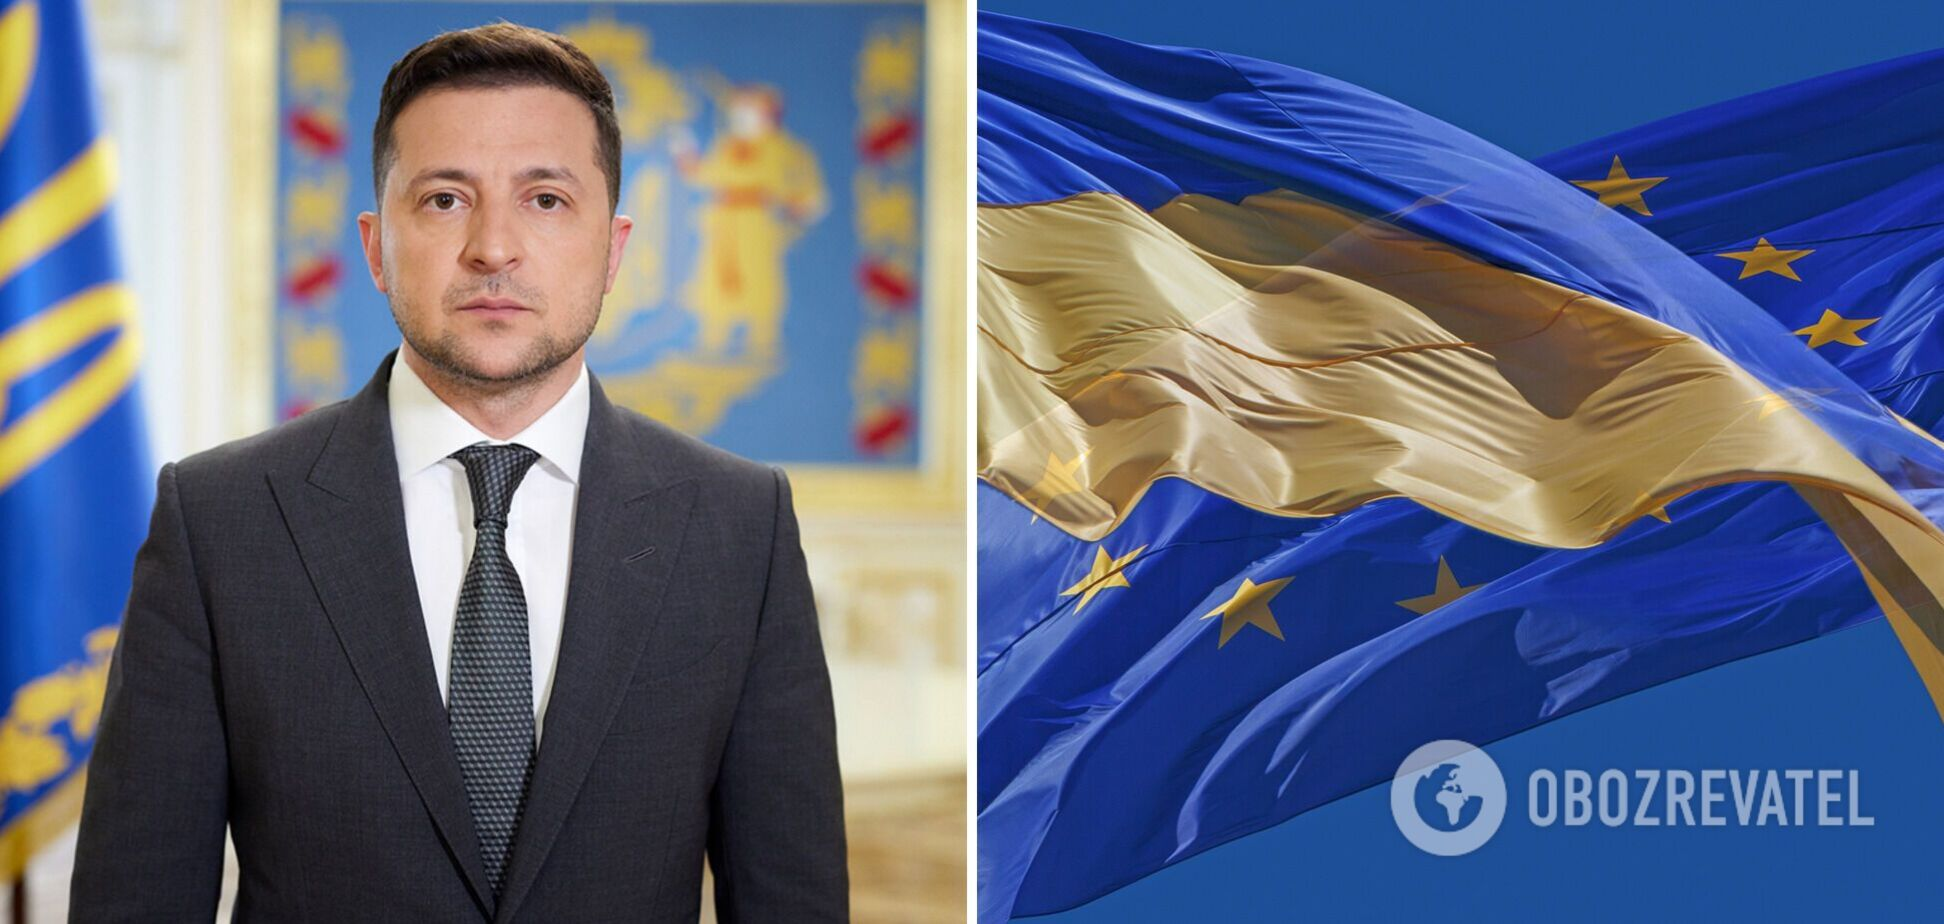 Зеленський: ми – центр Європи, Україна обов'язково буде в ЄС